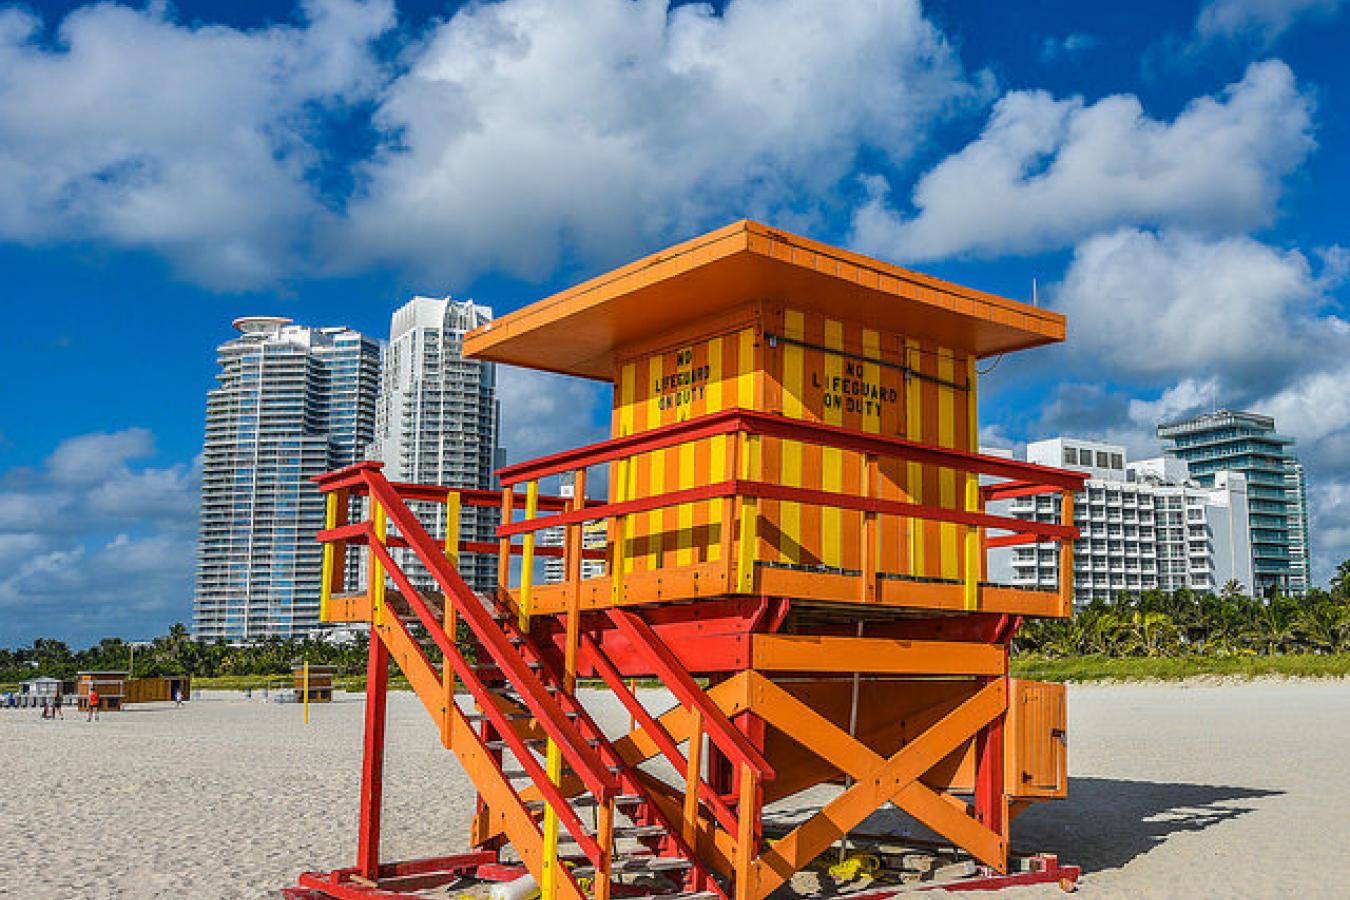 Colorful Lifeguard Stations Of Miami Beach, Florida, USA